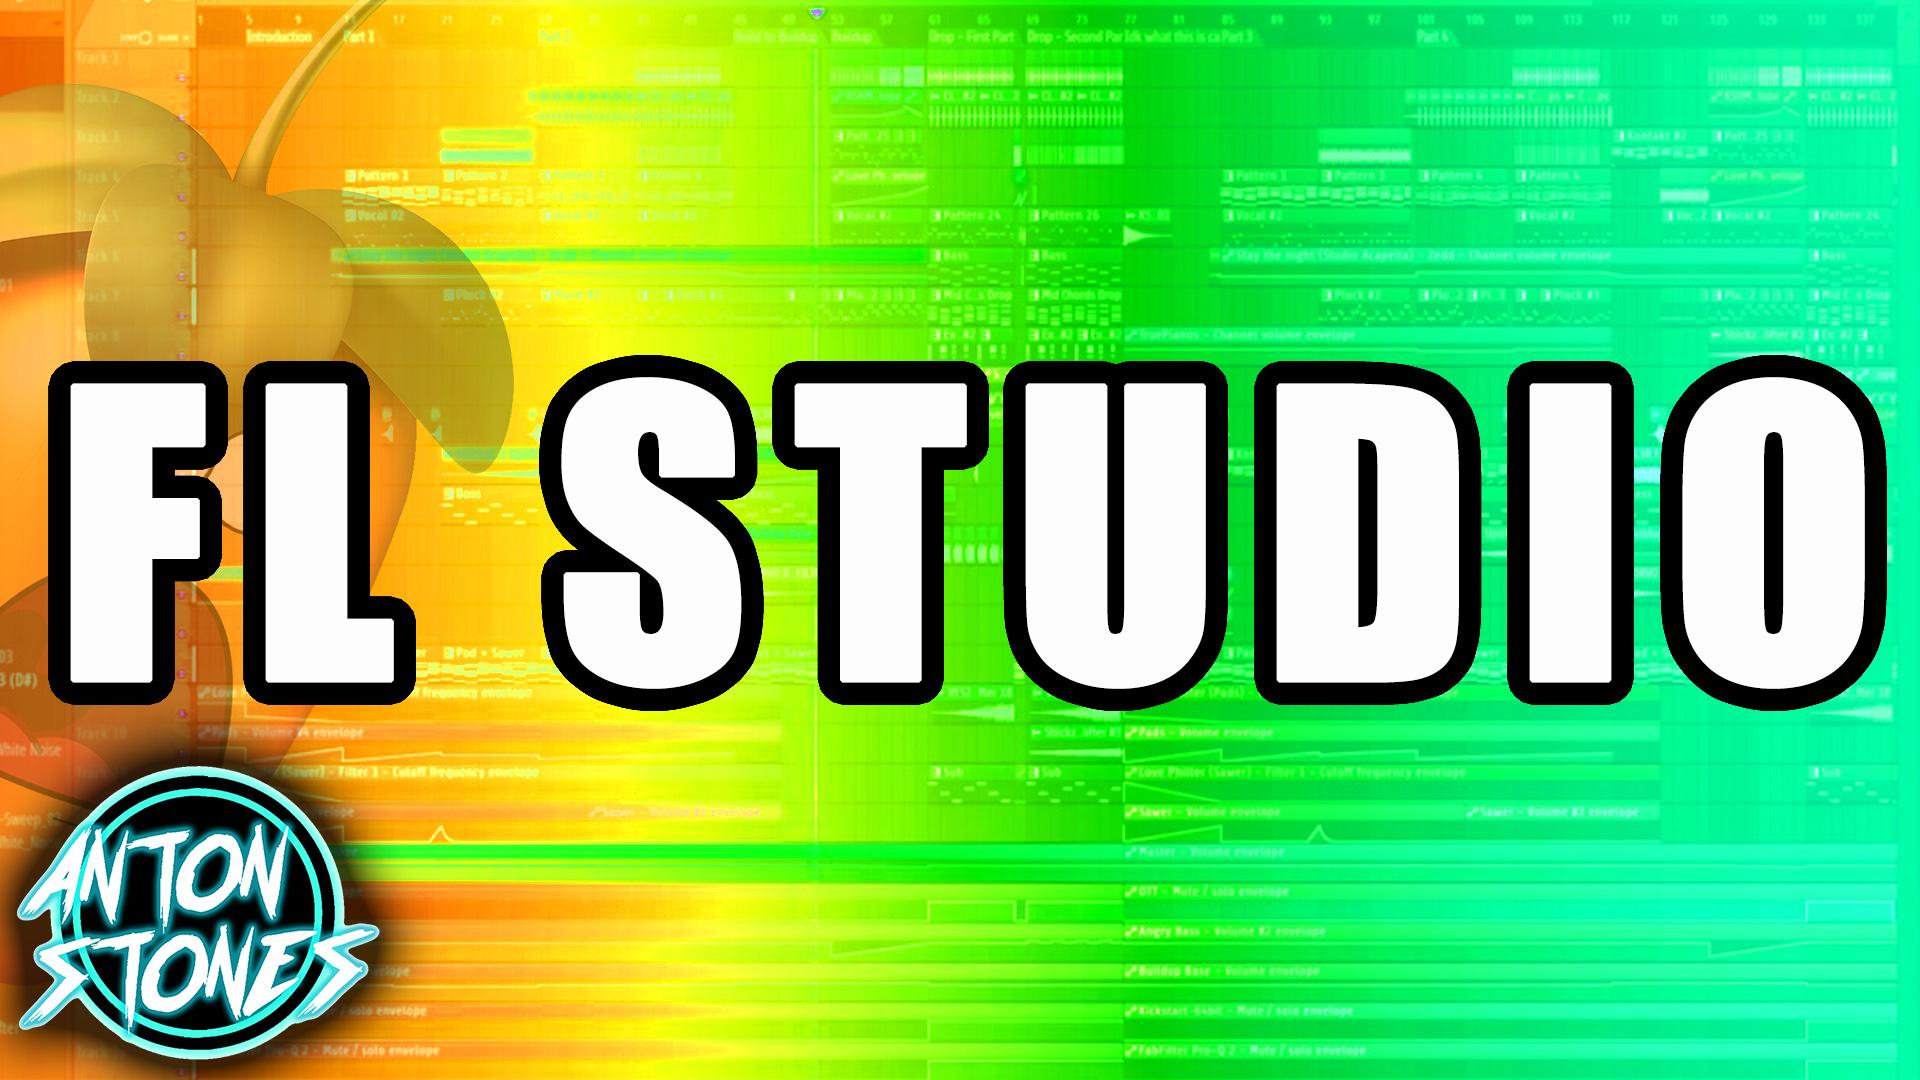 Tutorias do FL Studio